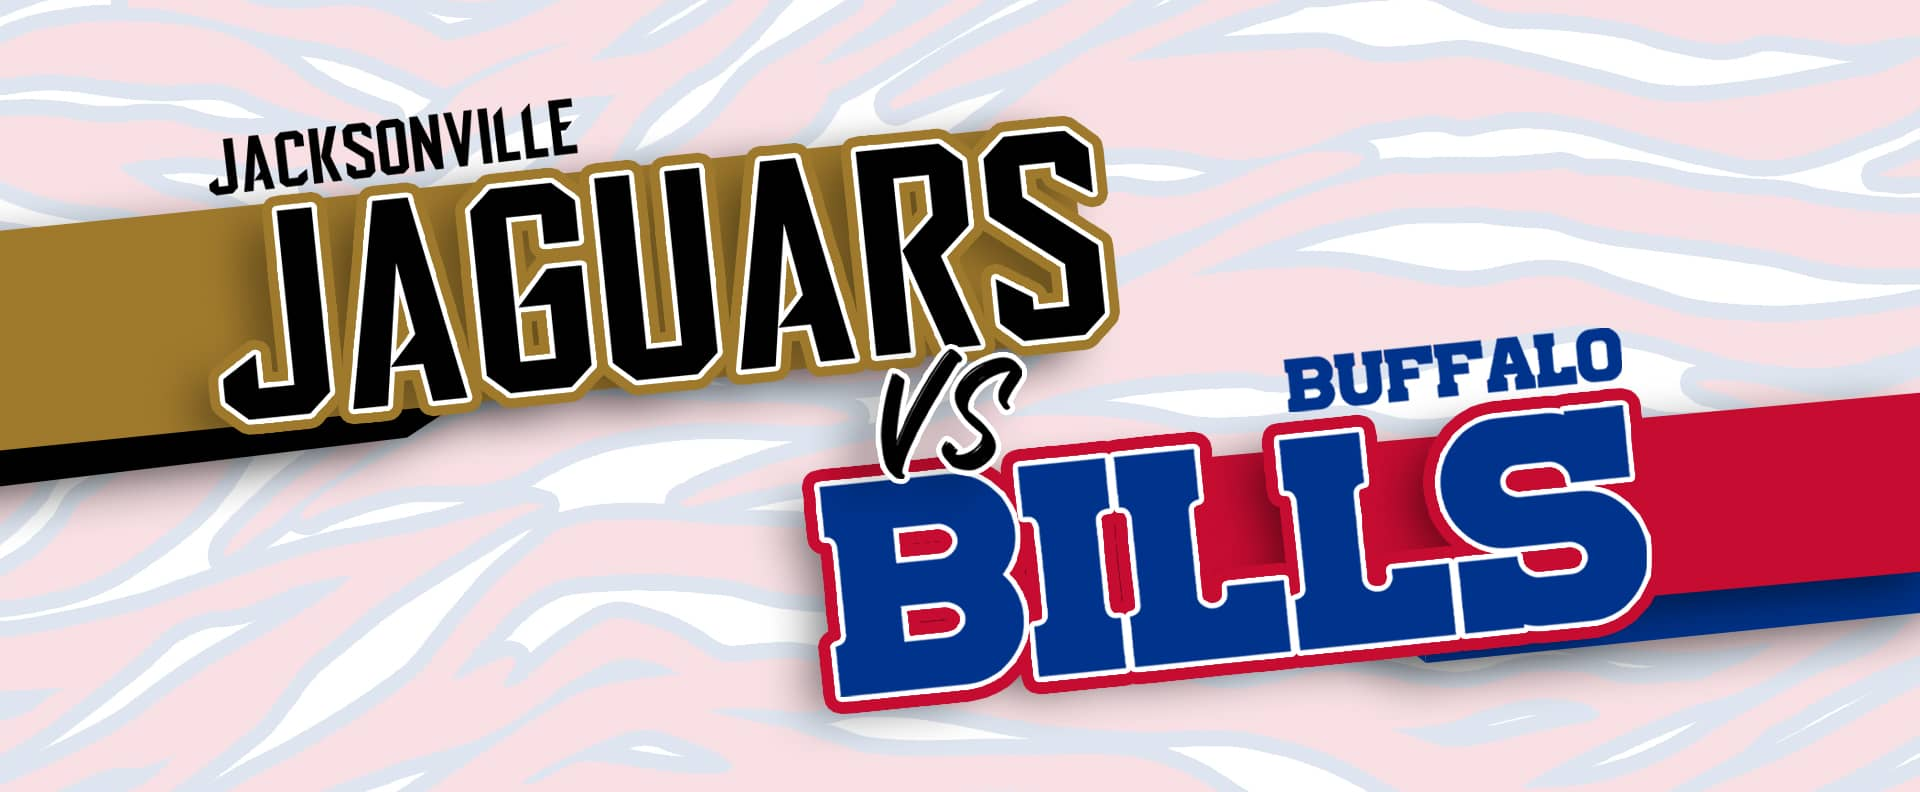 Buffalo Bills take on the Jacksonville Jaguars in Jacksonville Florida!